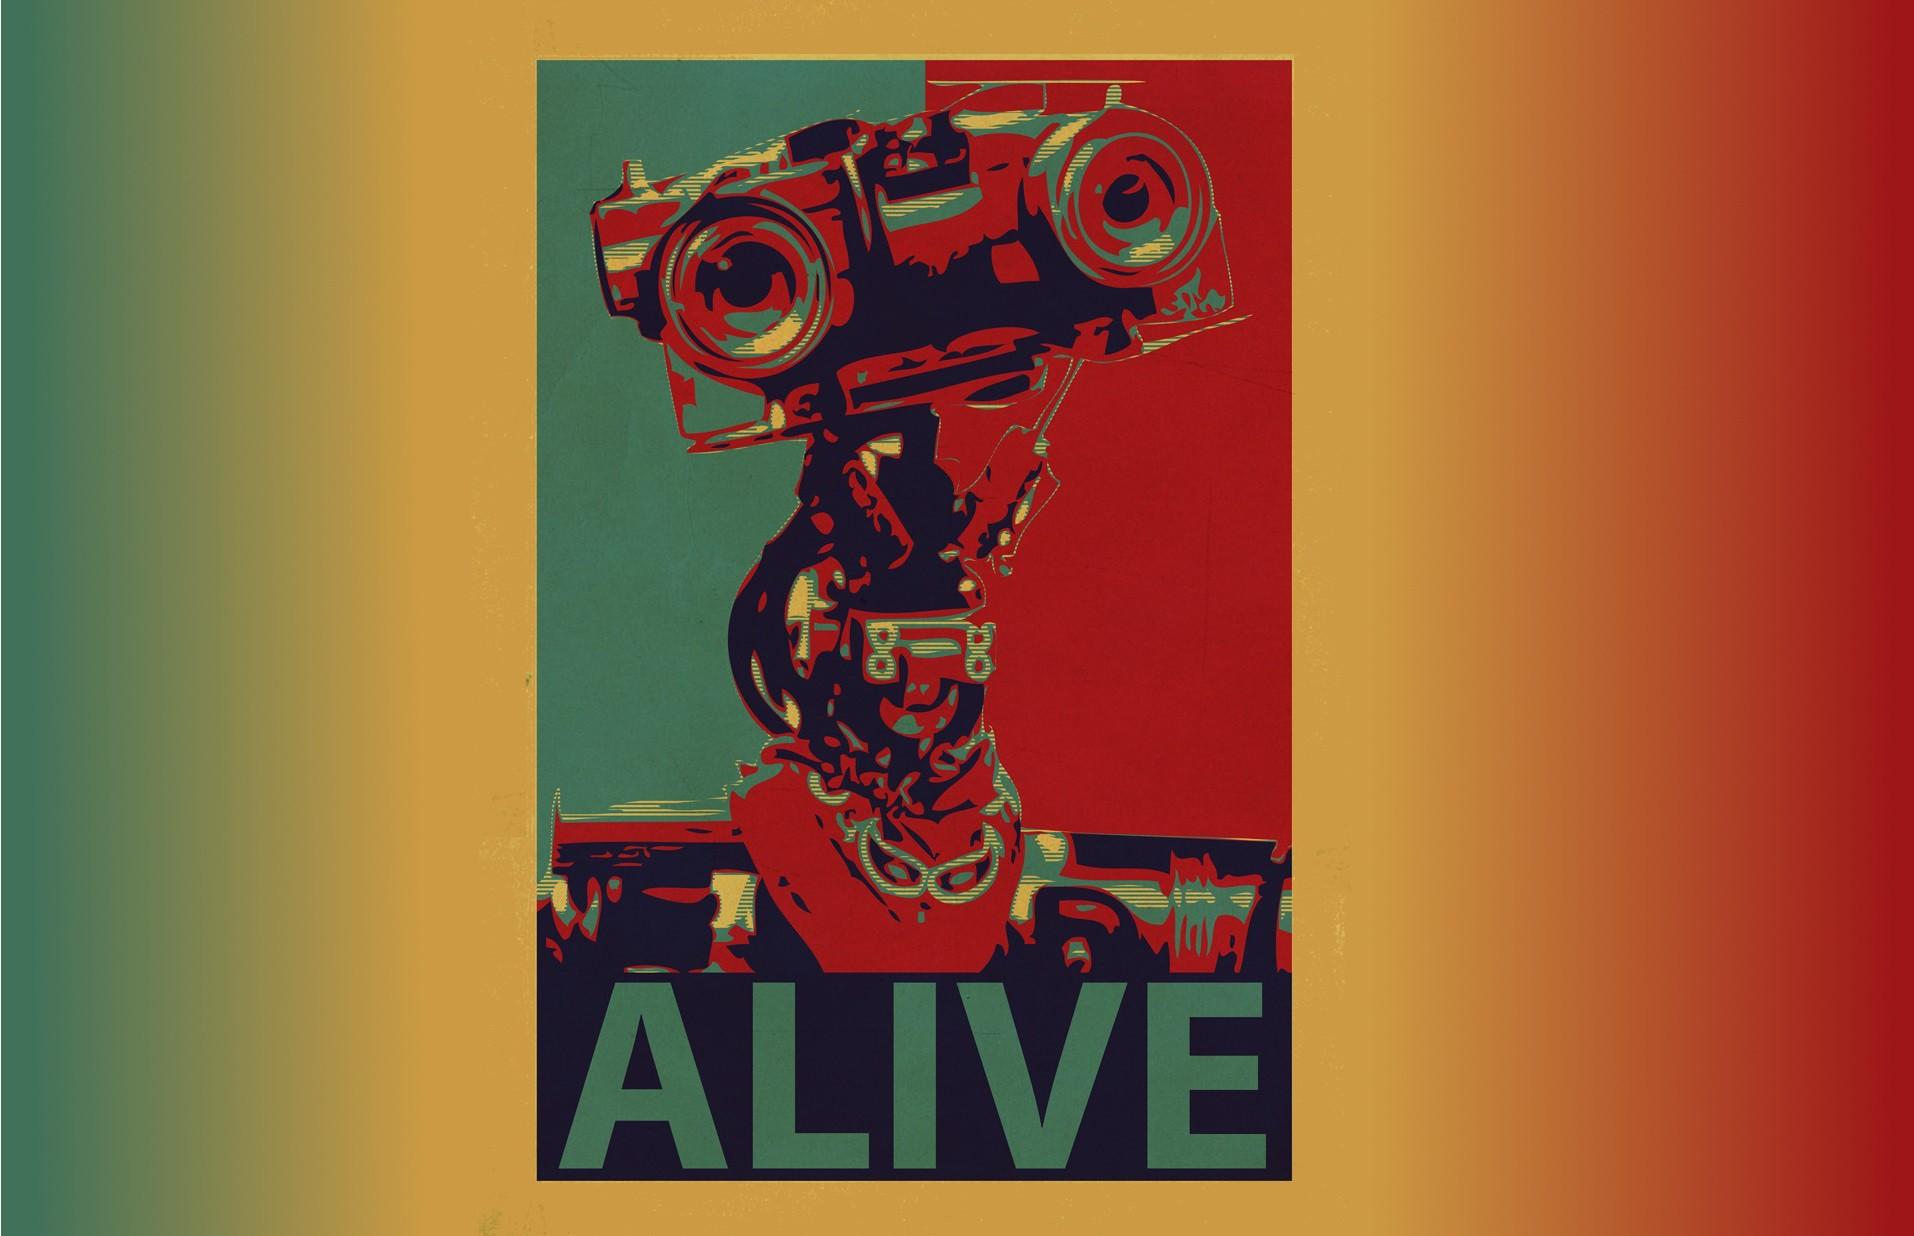 Wallpaper Illustration Graphic Design Roar Movie: 배경 화면 : 삽화, 기계 인간, 빨간, 영화 산업, 그래픽 디자인, 공상 과학 소설, 컨셉 아트, 생명